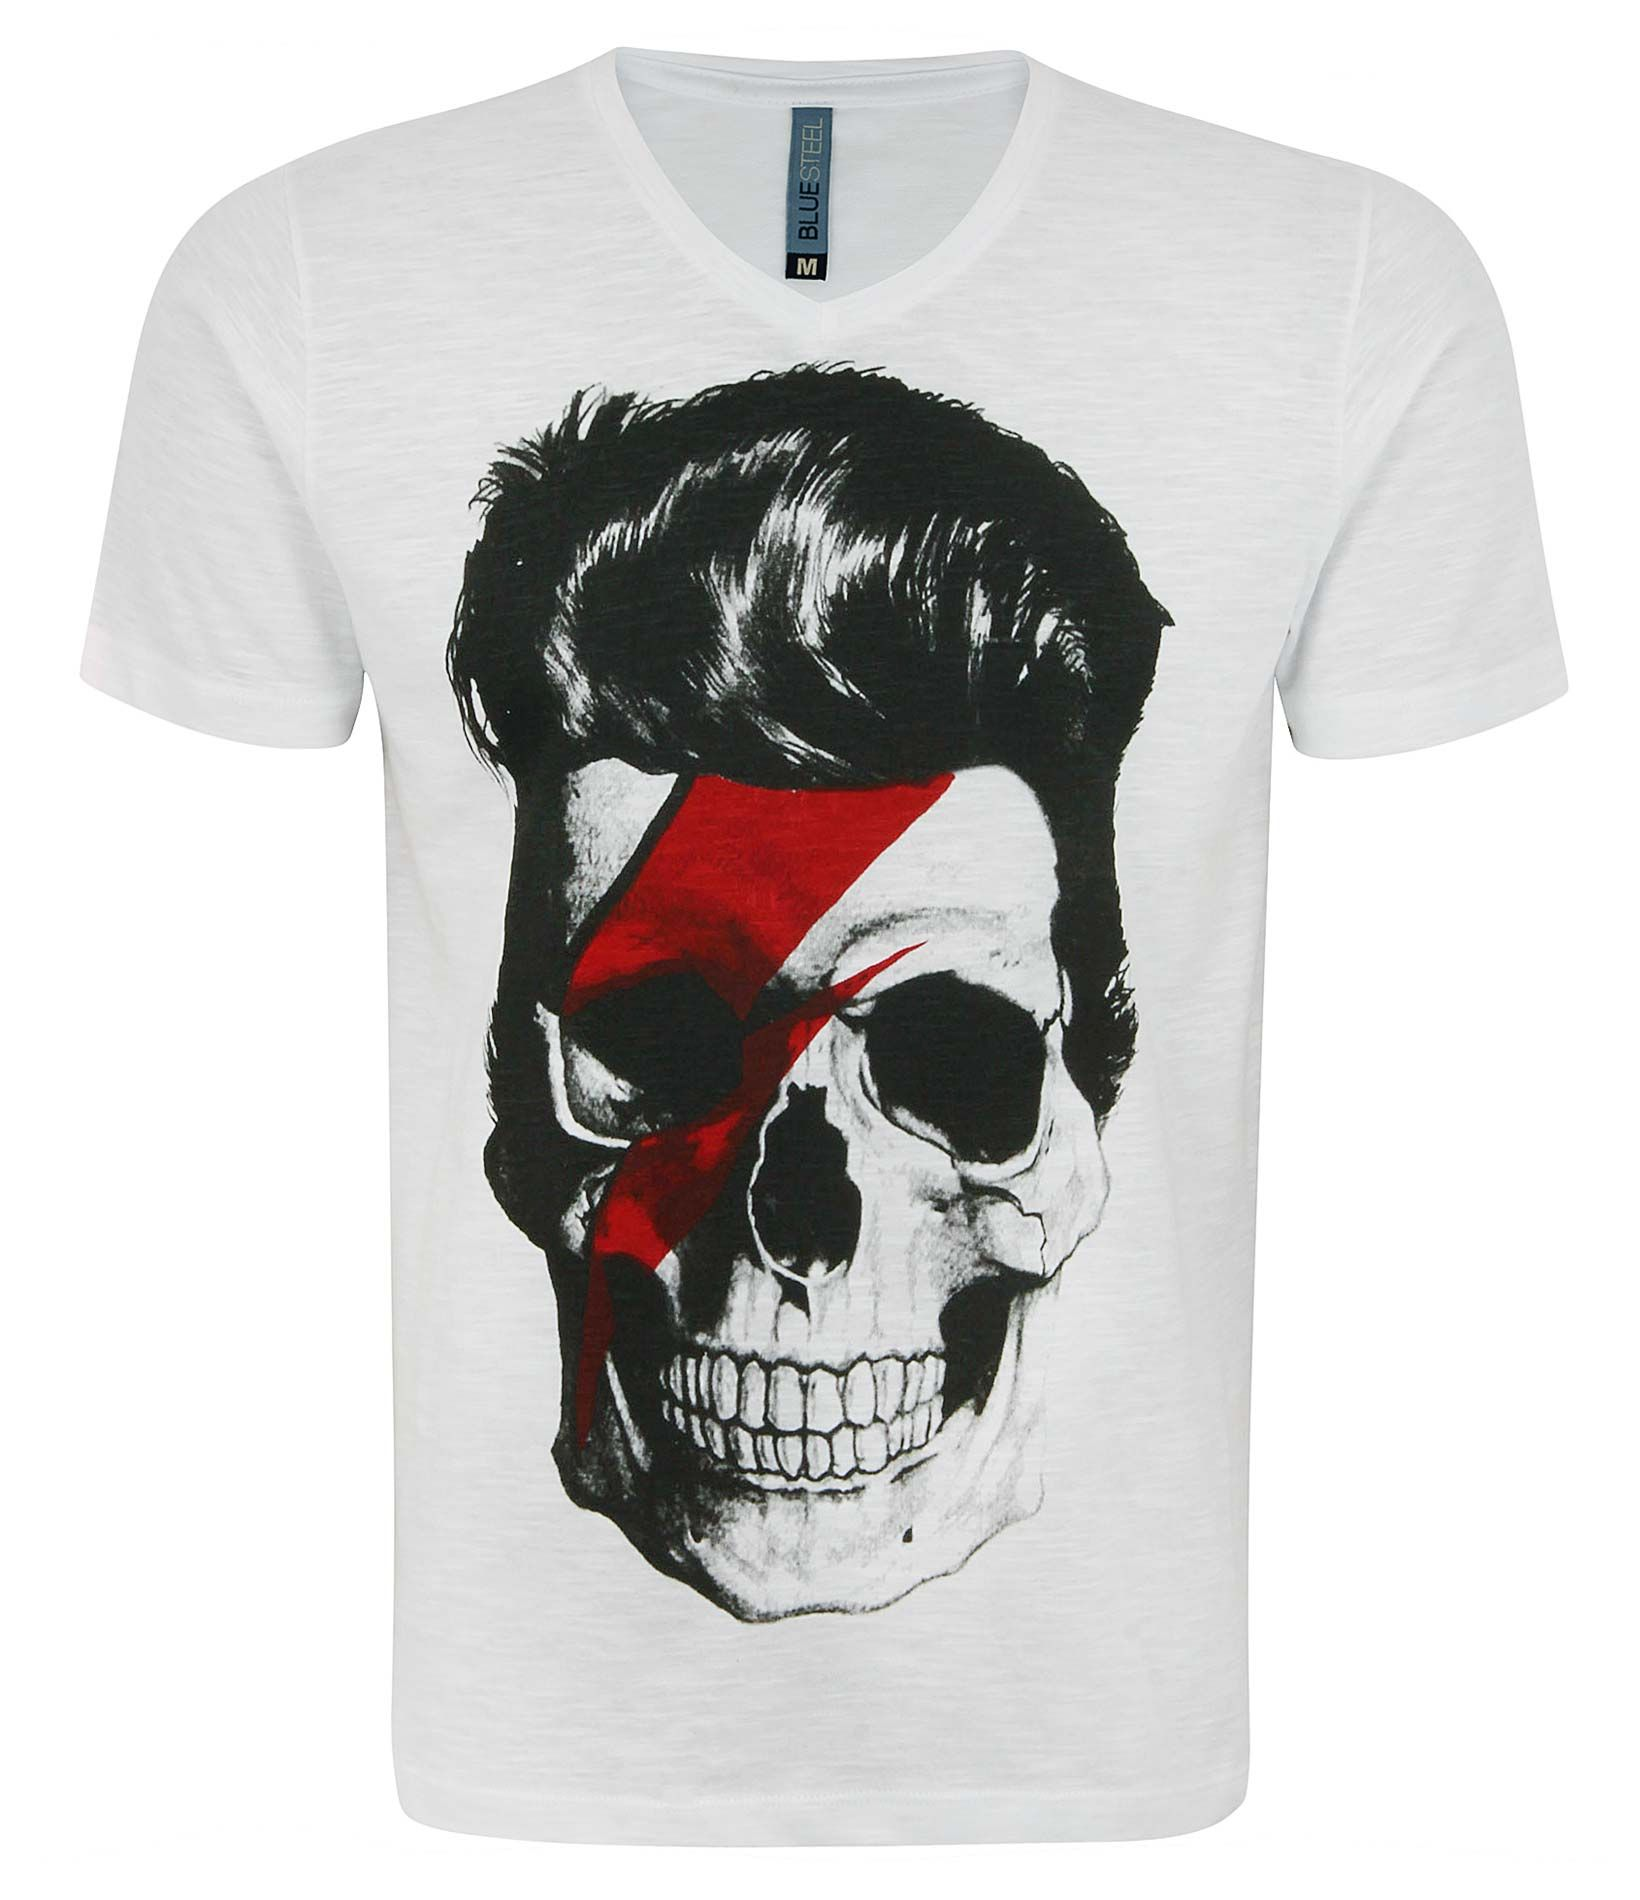 Camiseta Masculina Estampa Caveira David Bowie  29.90  6ea6c7acb6b